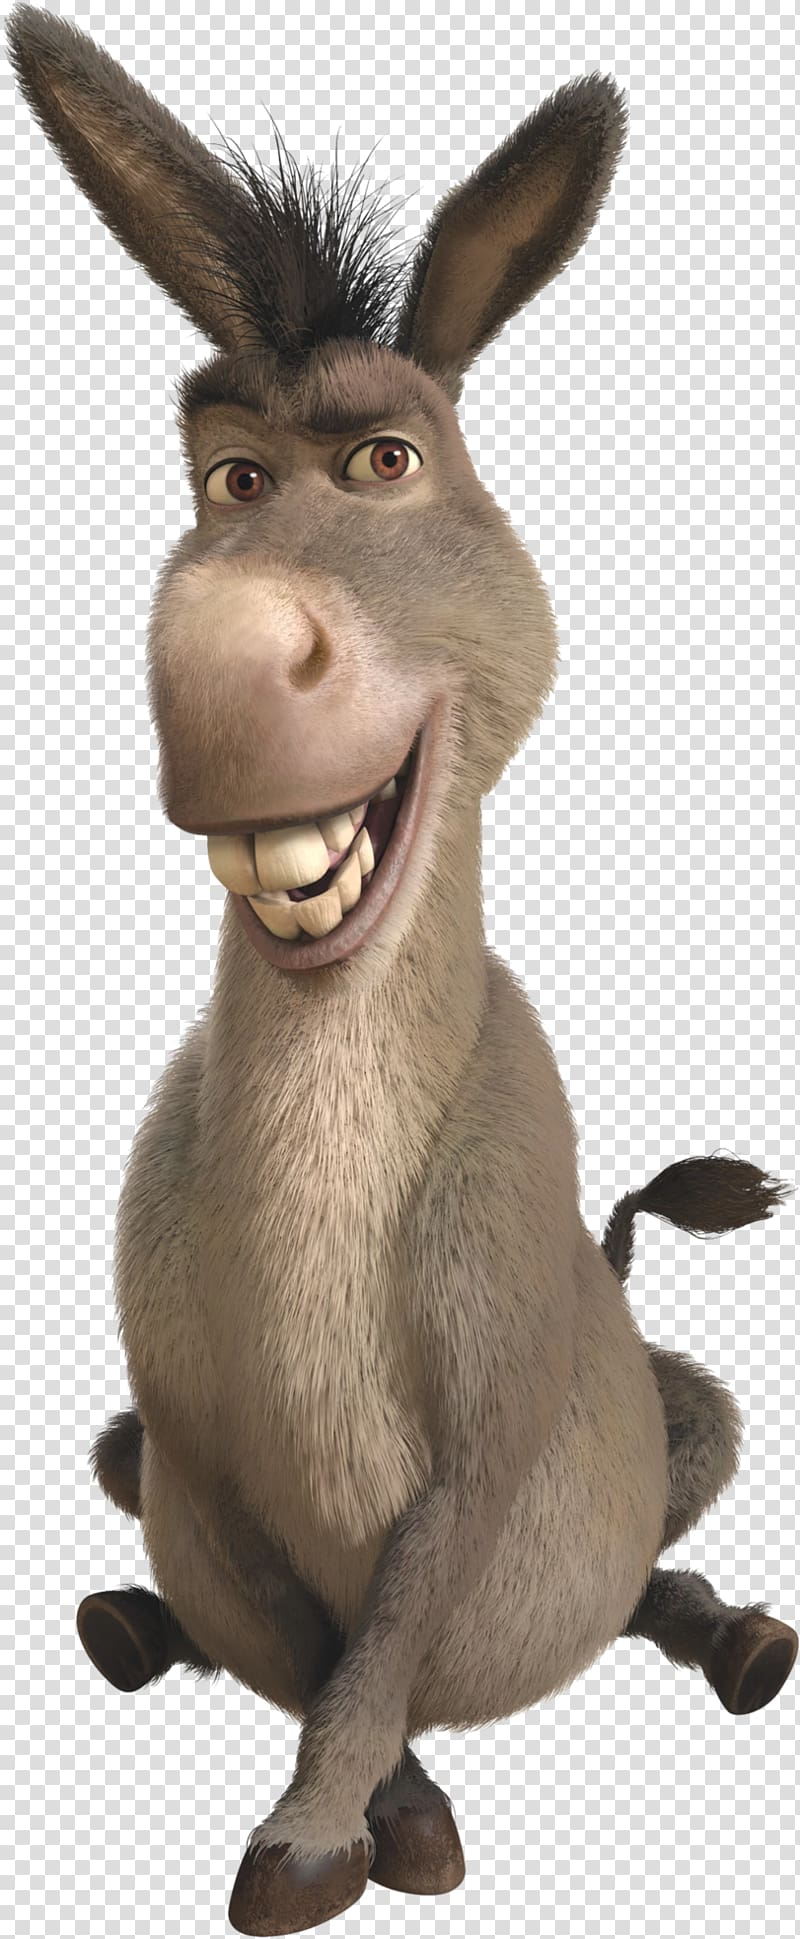 Donkey Princess Fiona Puss in Boots Shrek Film Series, donkey PNG